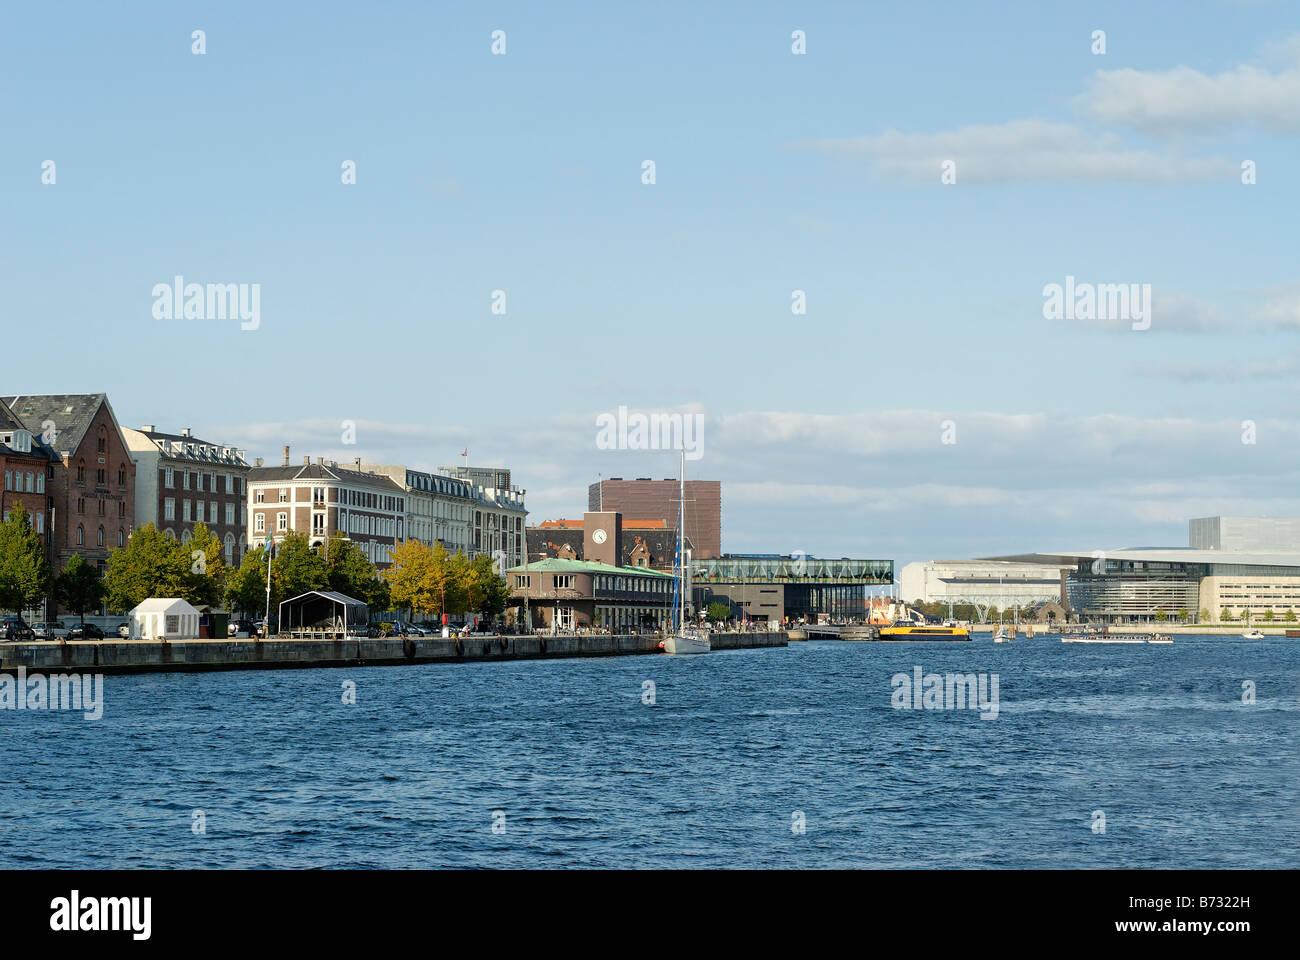 View on the Copenhagen city Denmark - Stock Image